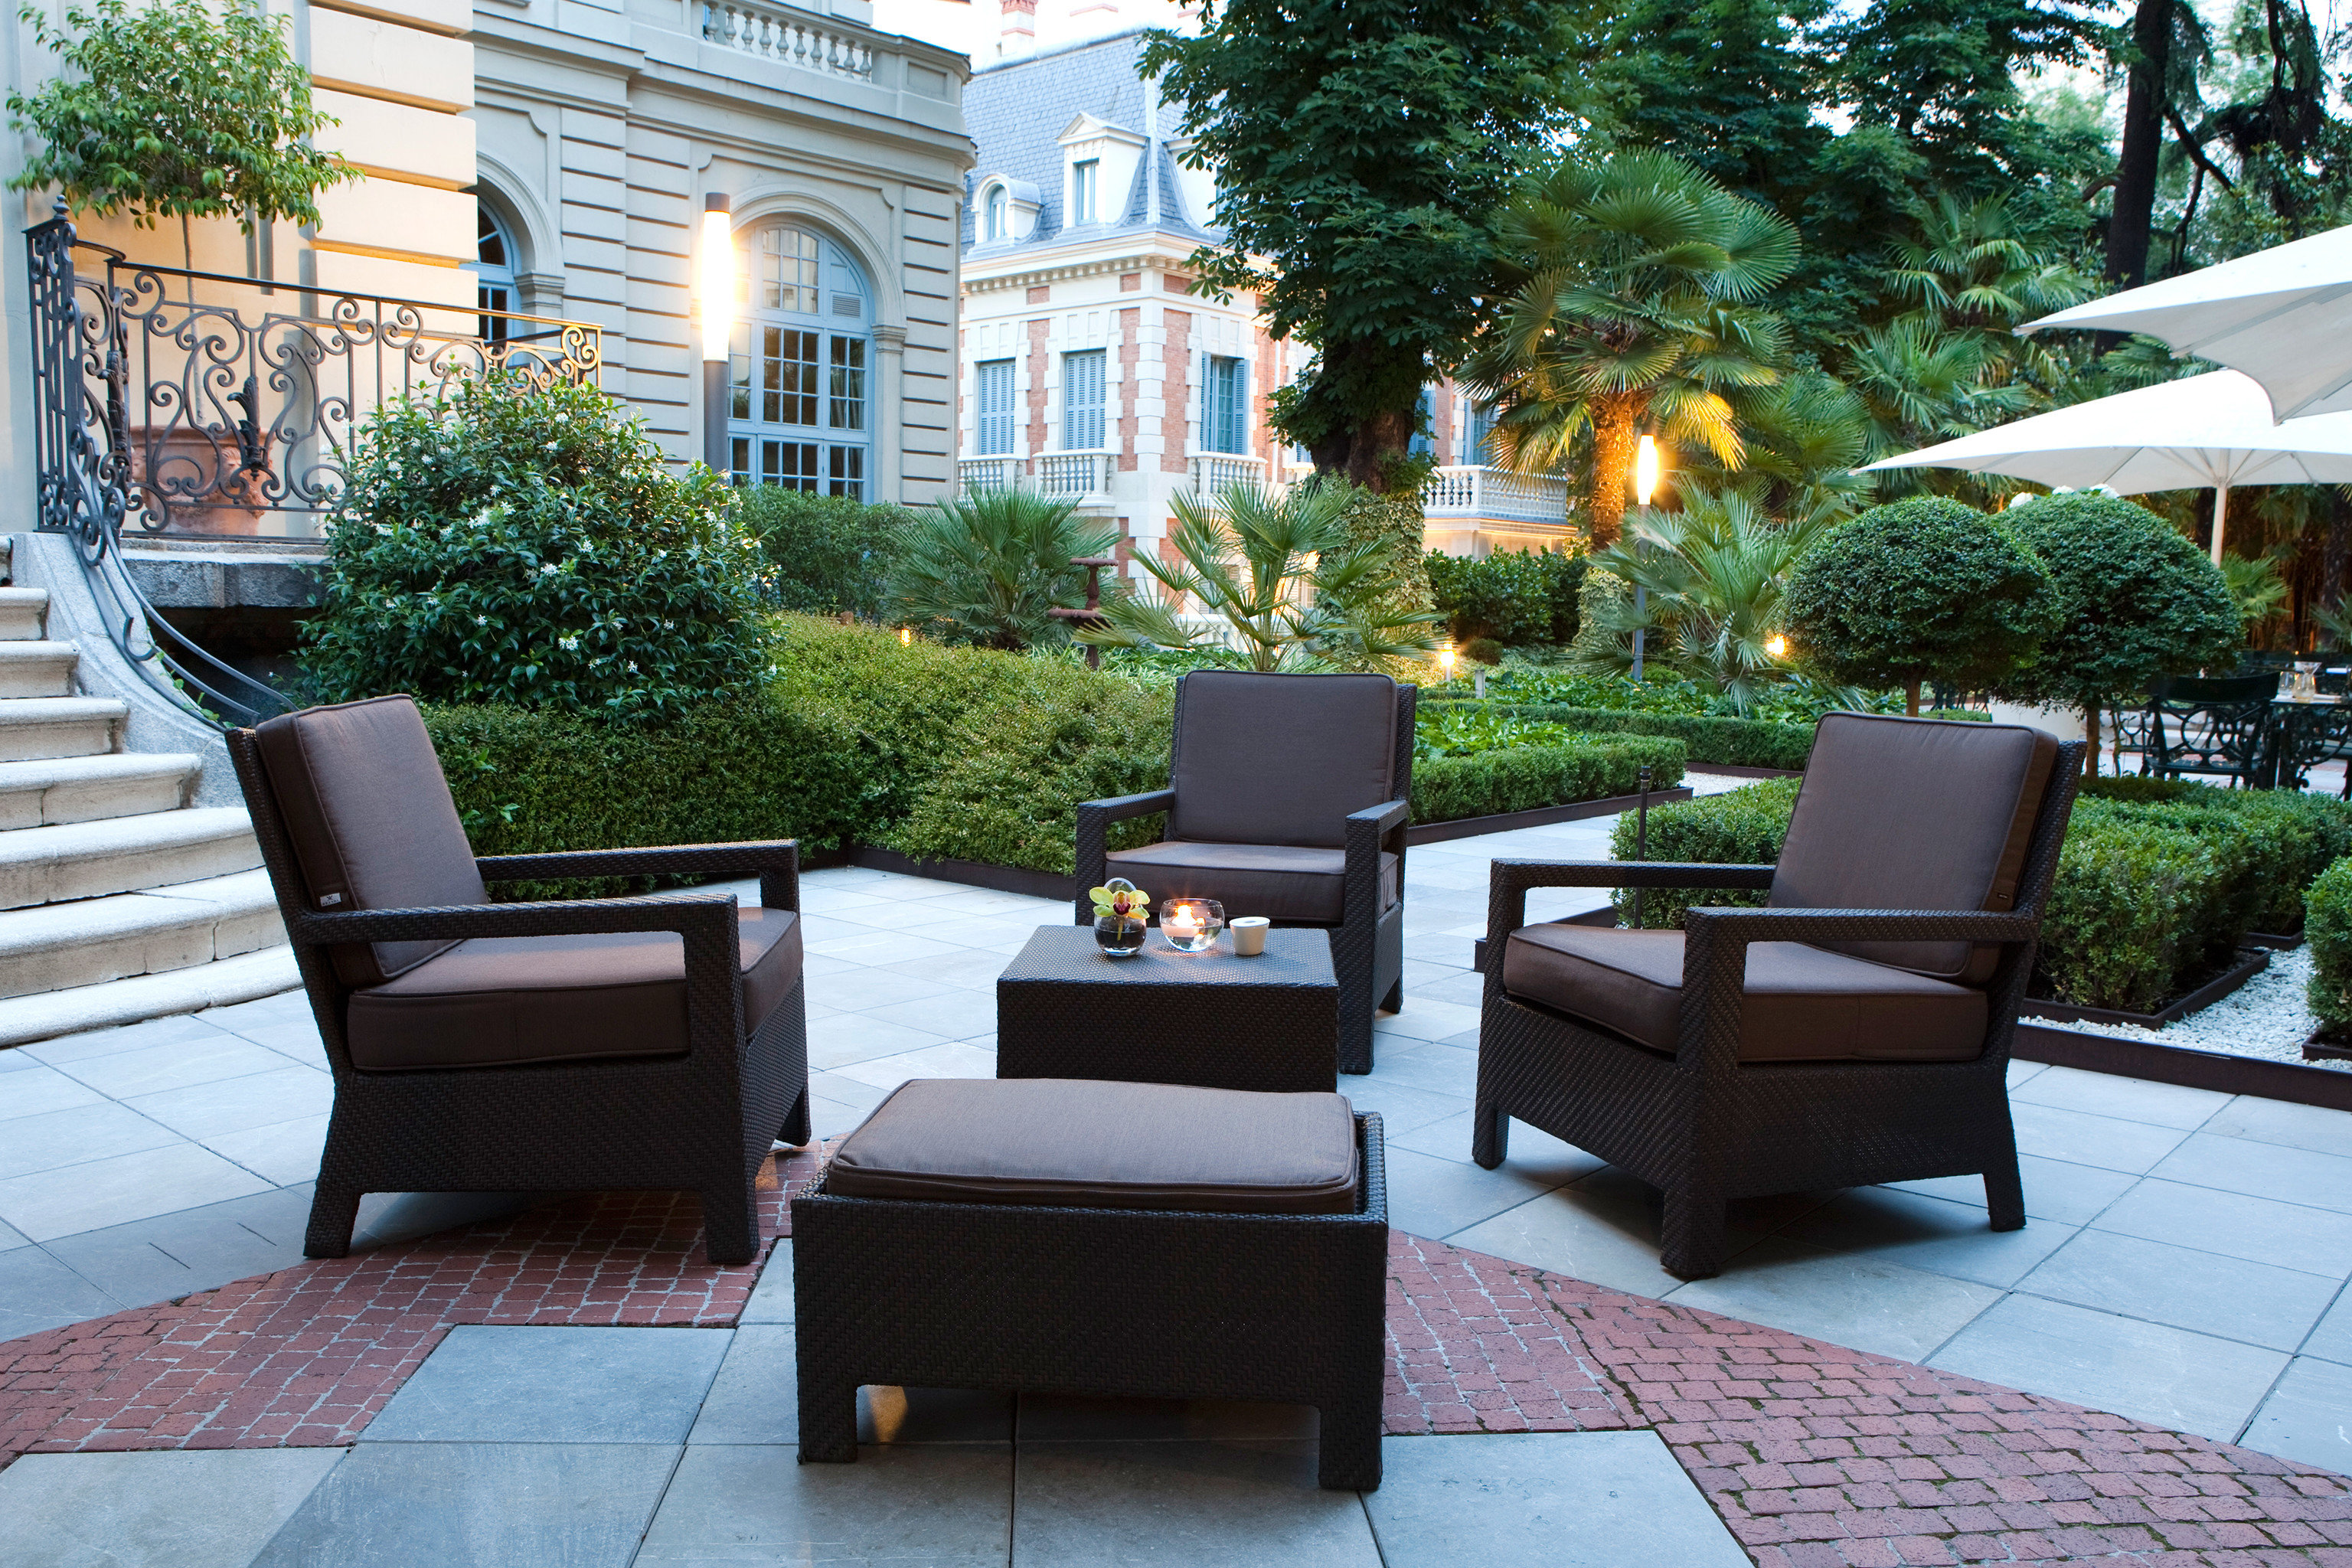 Hip Lounge Luxury Modern tree ground property Courtyard home sidewalk outdoor structure condominium backyard porch living room Patio Lobby yard stone